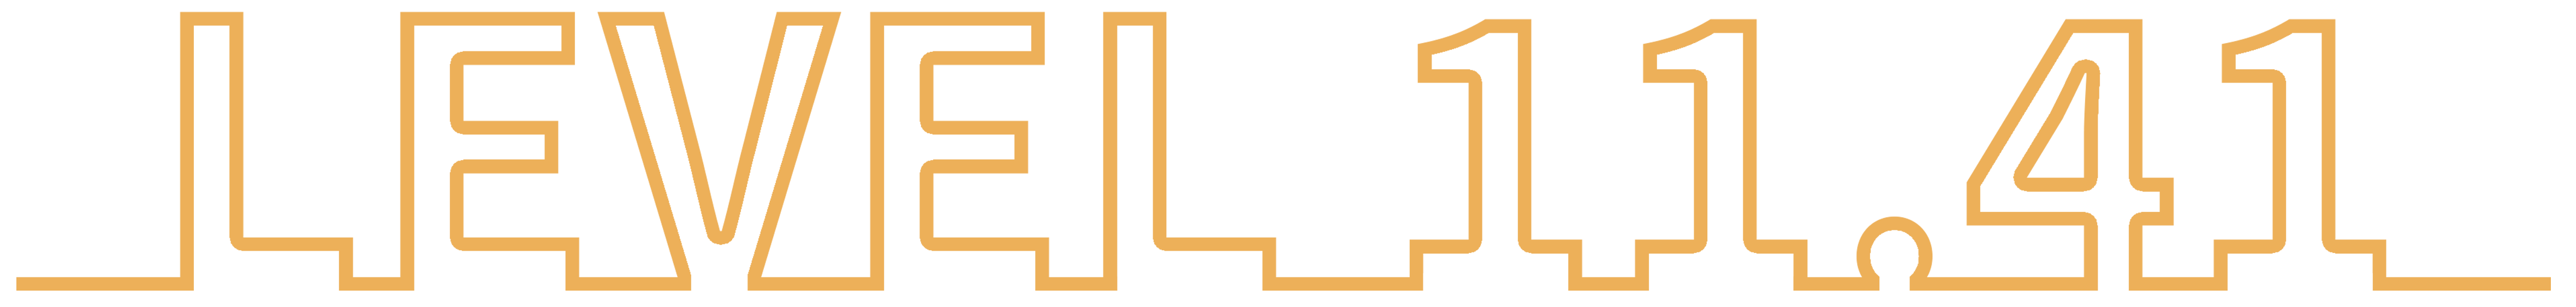 Level 11.41